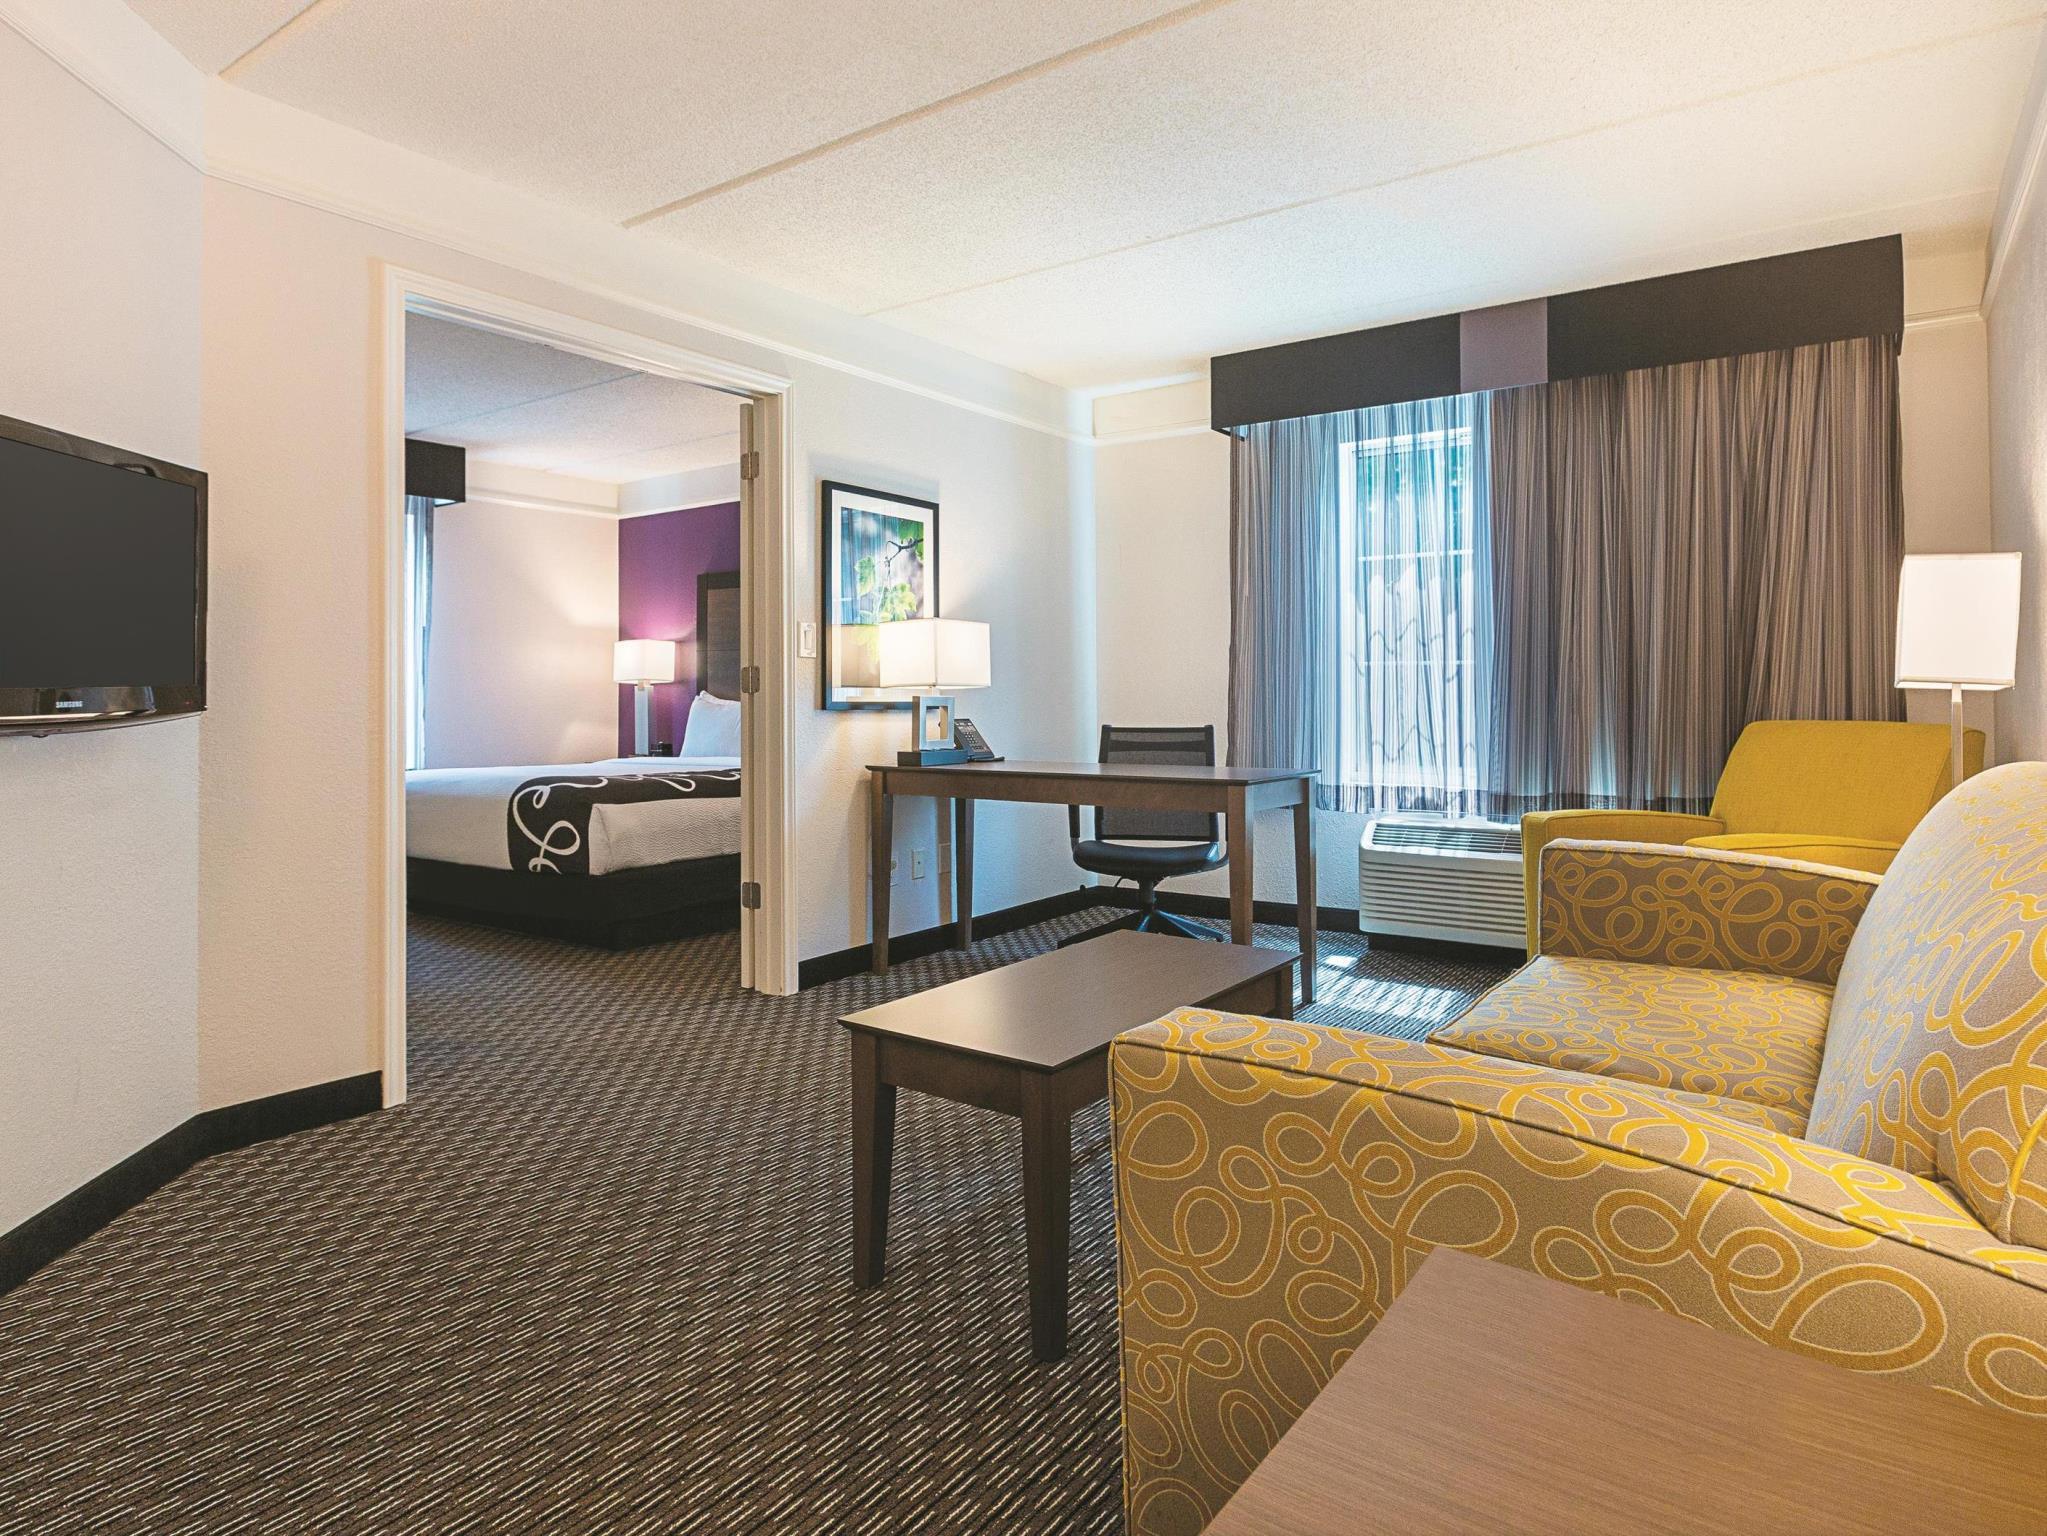 La Quinta Inn & Suites By Wyndham Atlanta Alpharetta